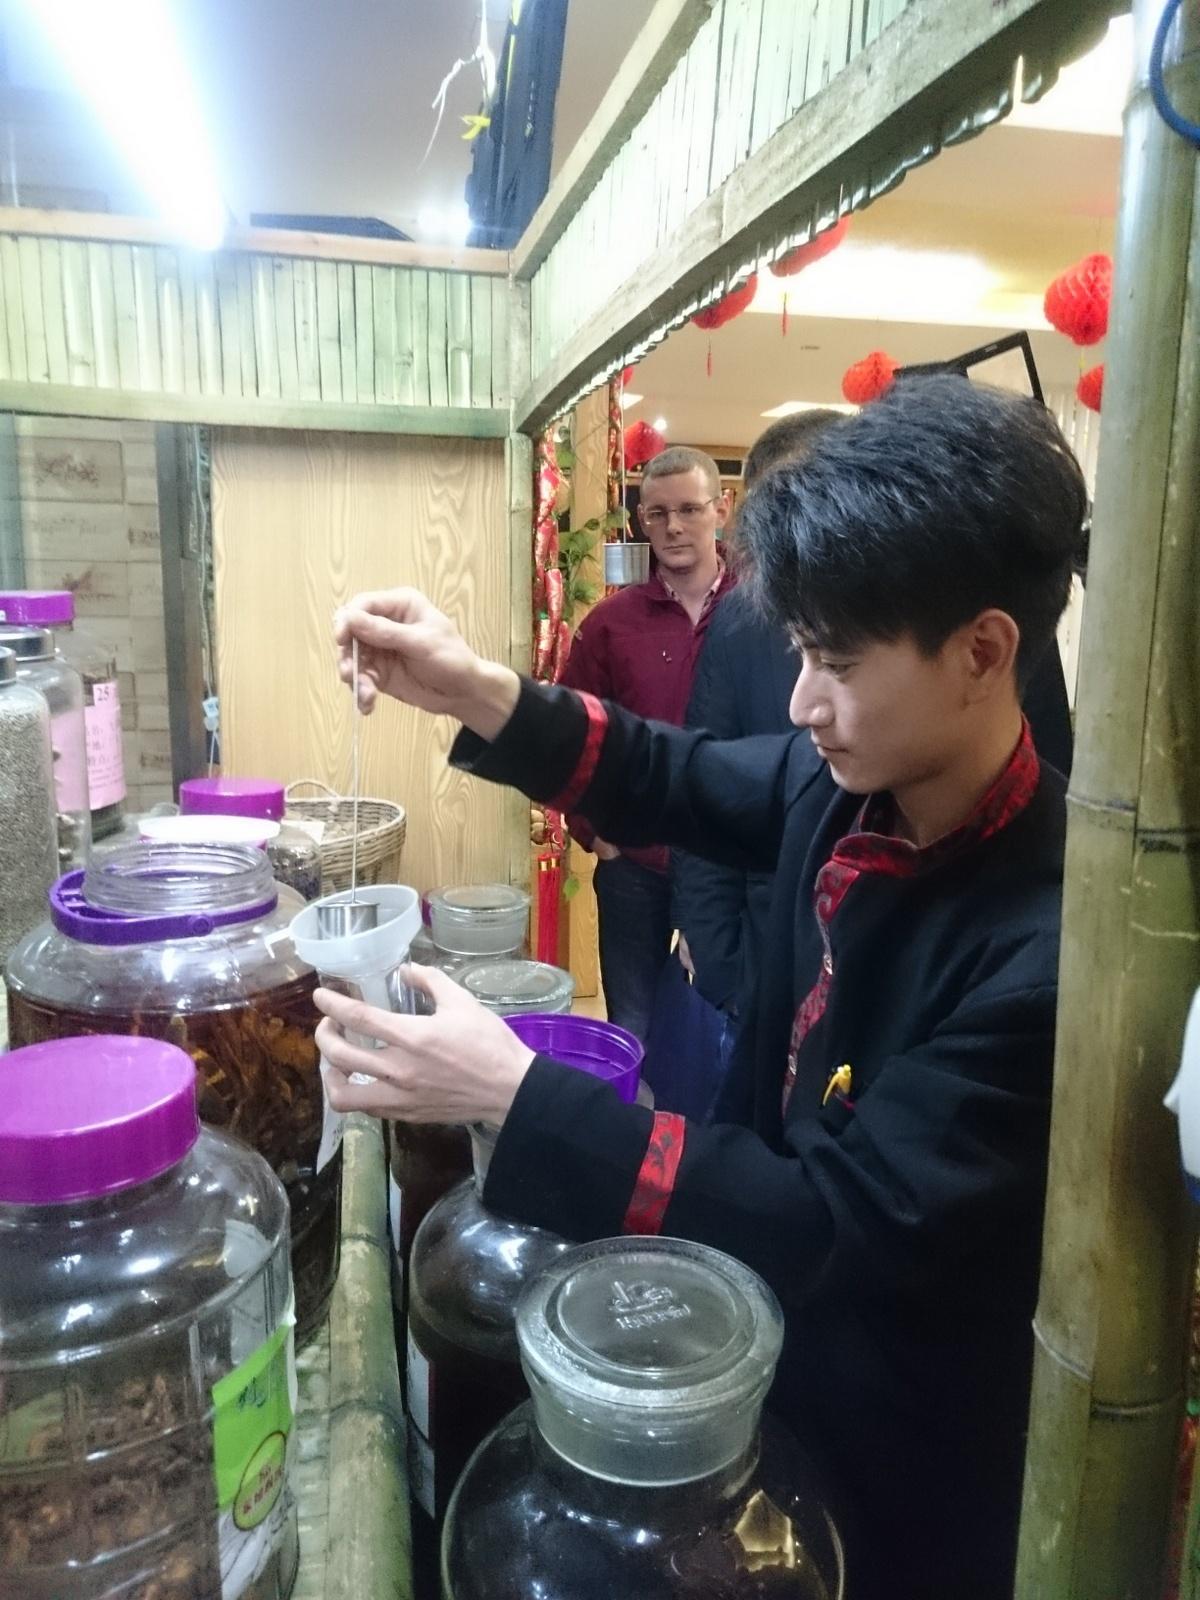 Китай. Завод устройств для «Умного дома». Учимся и учим - 60